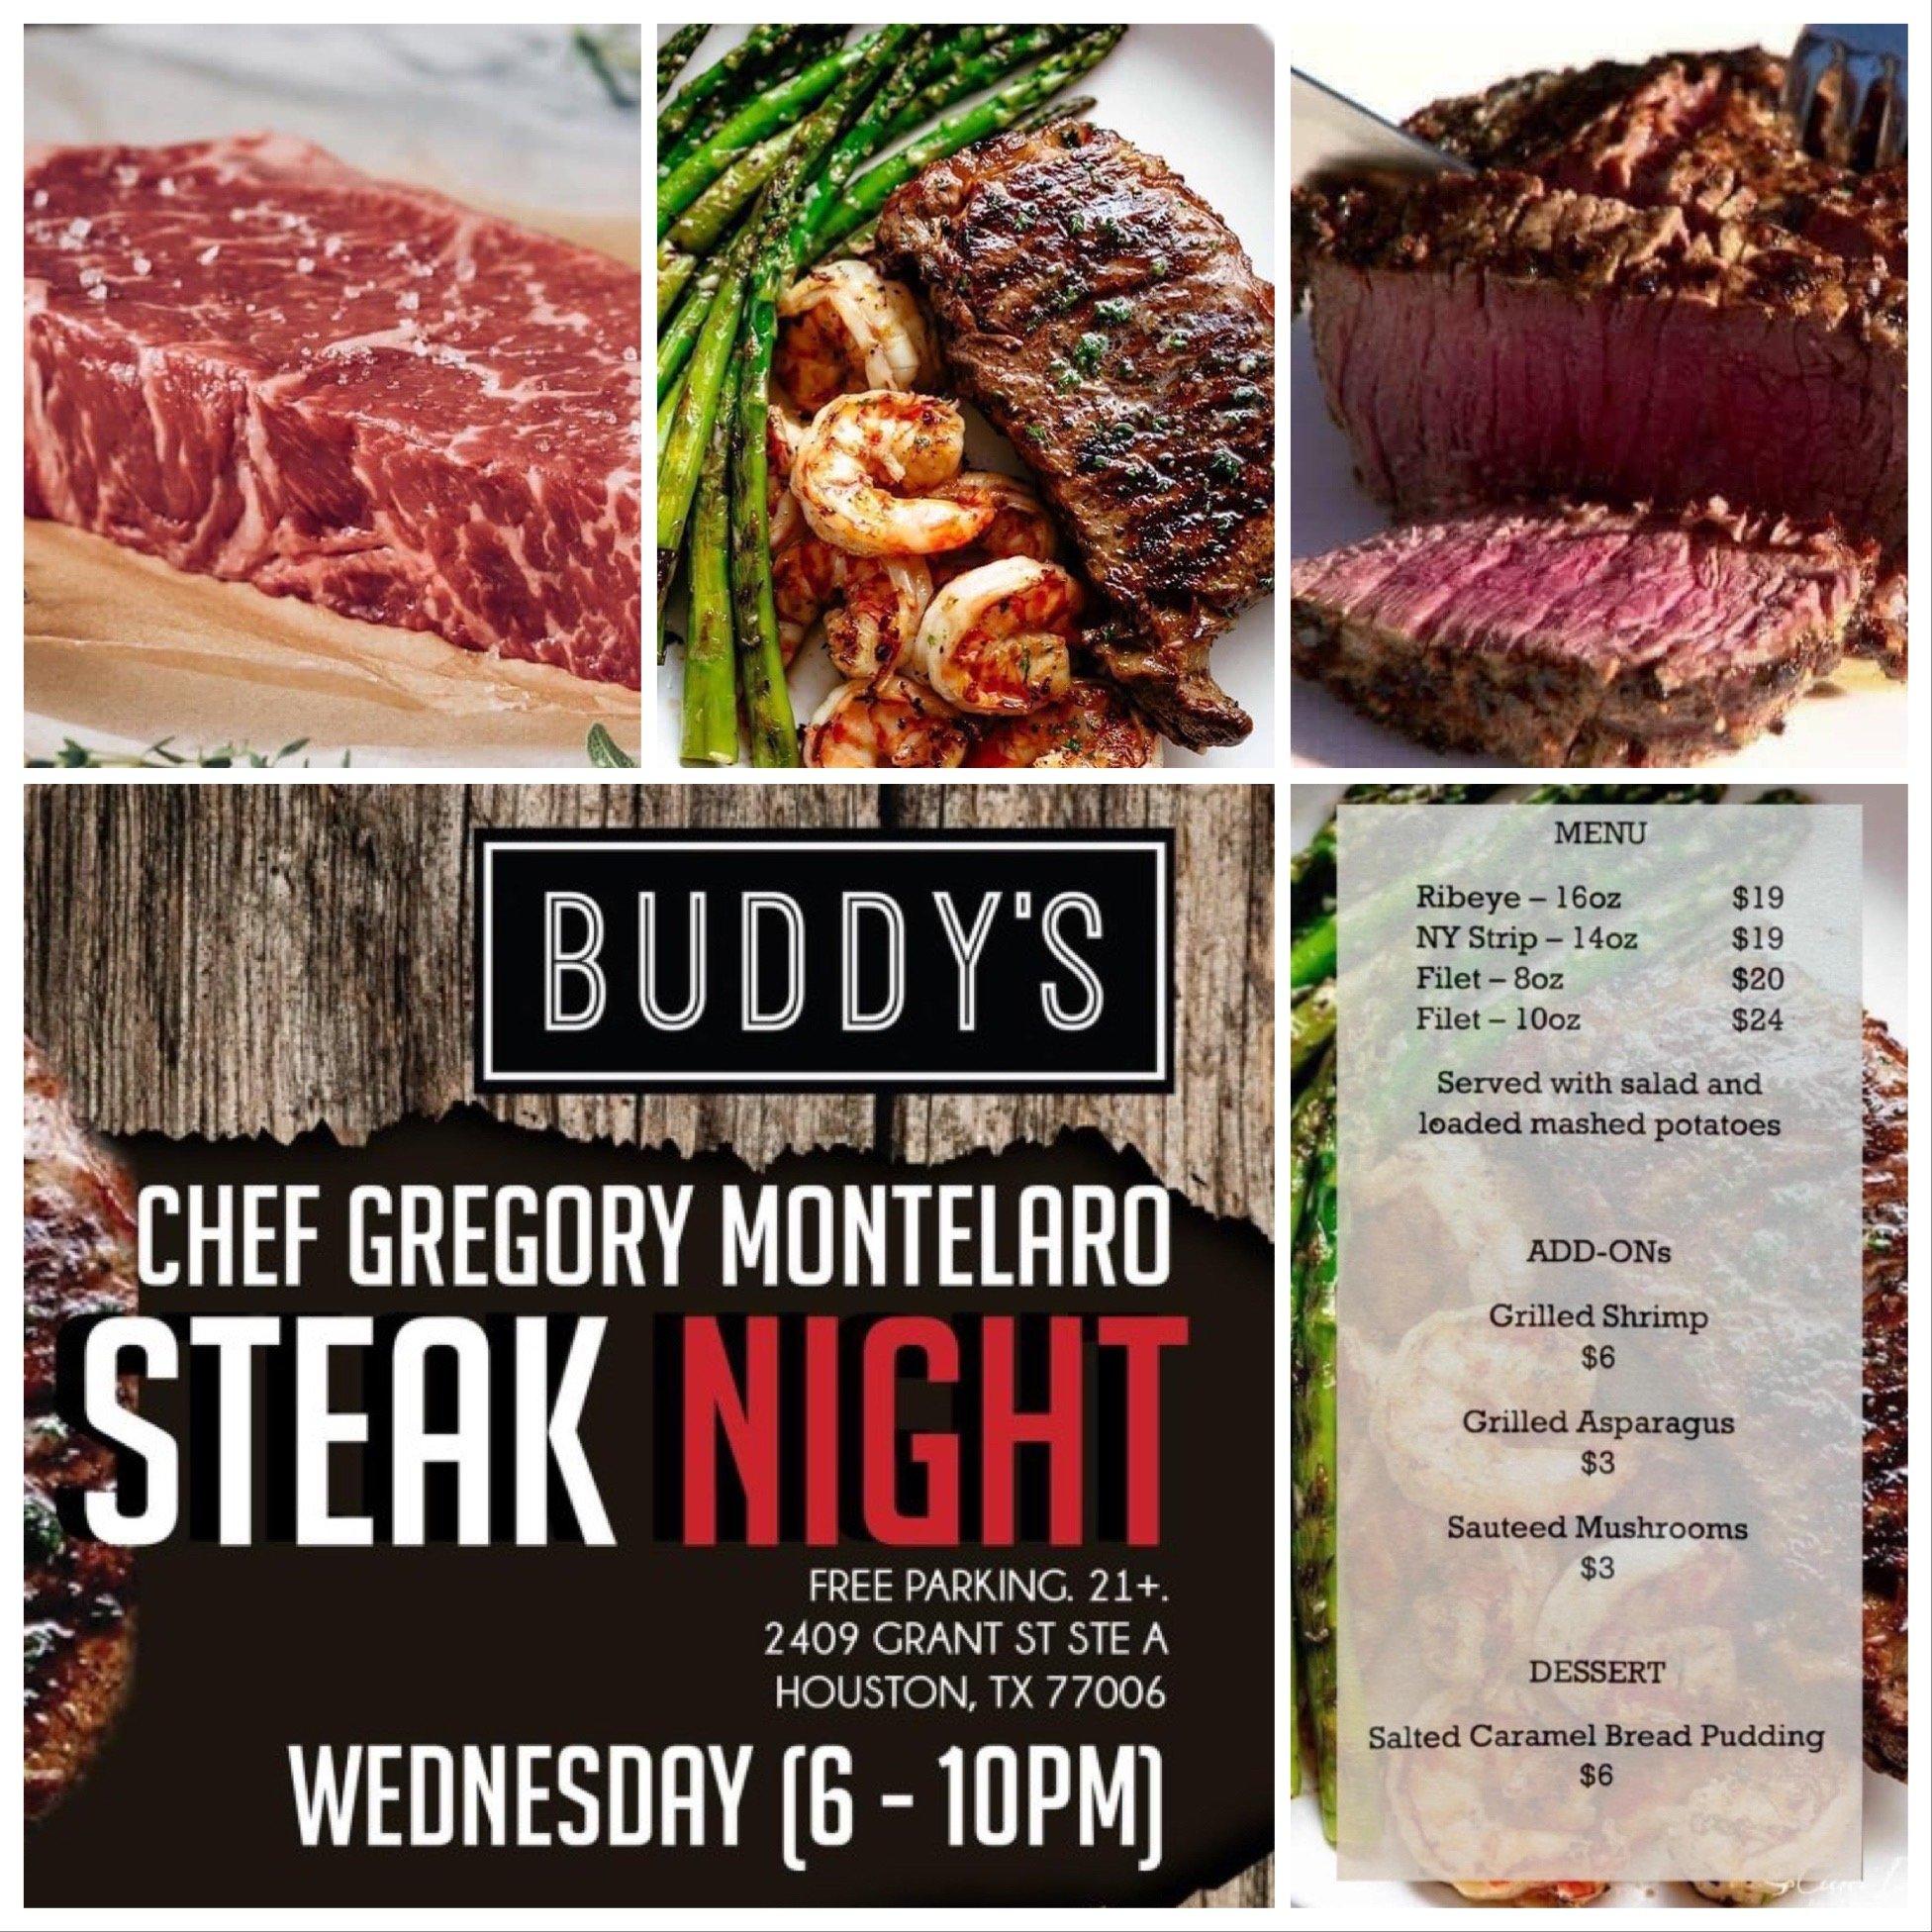 Houston-Steak-Night-Montrose-BUDDYS-Gay-Bar-20210303